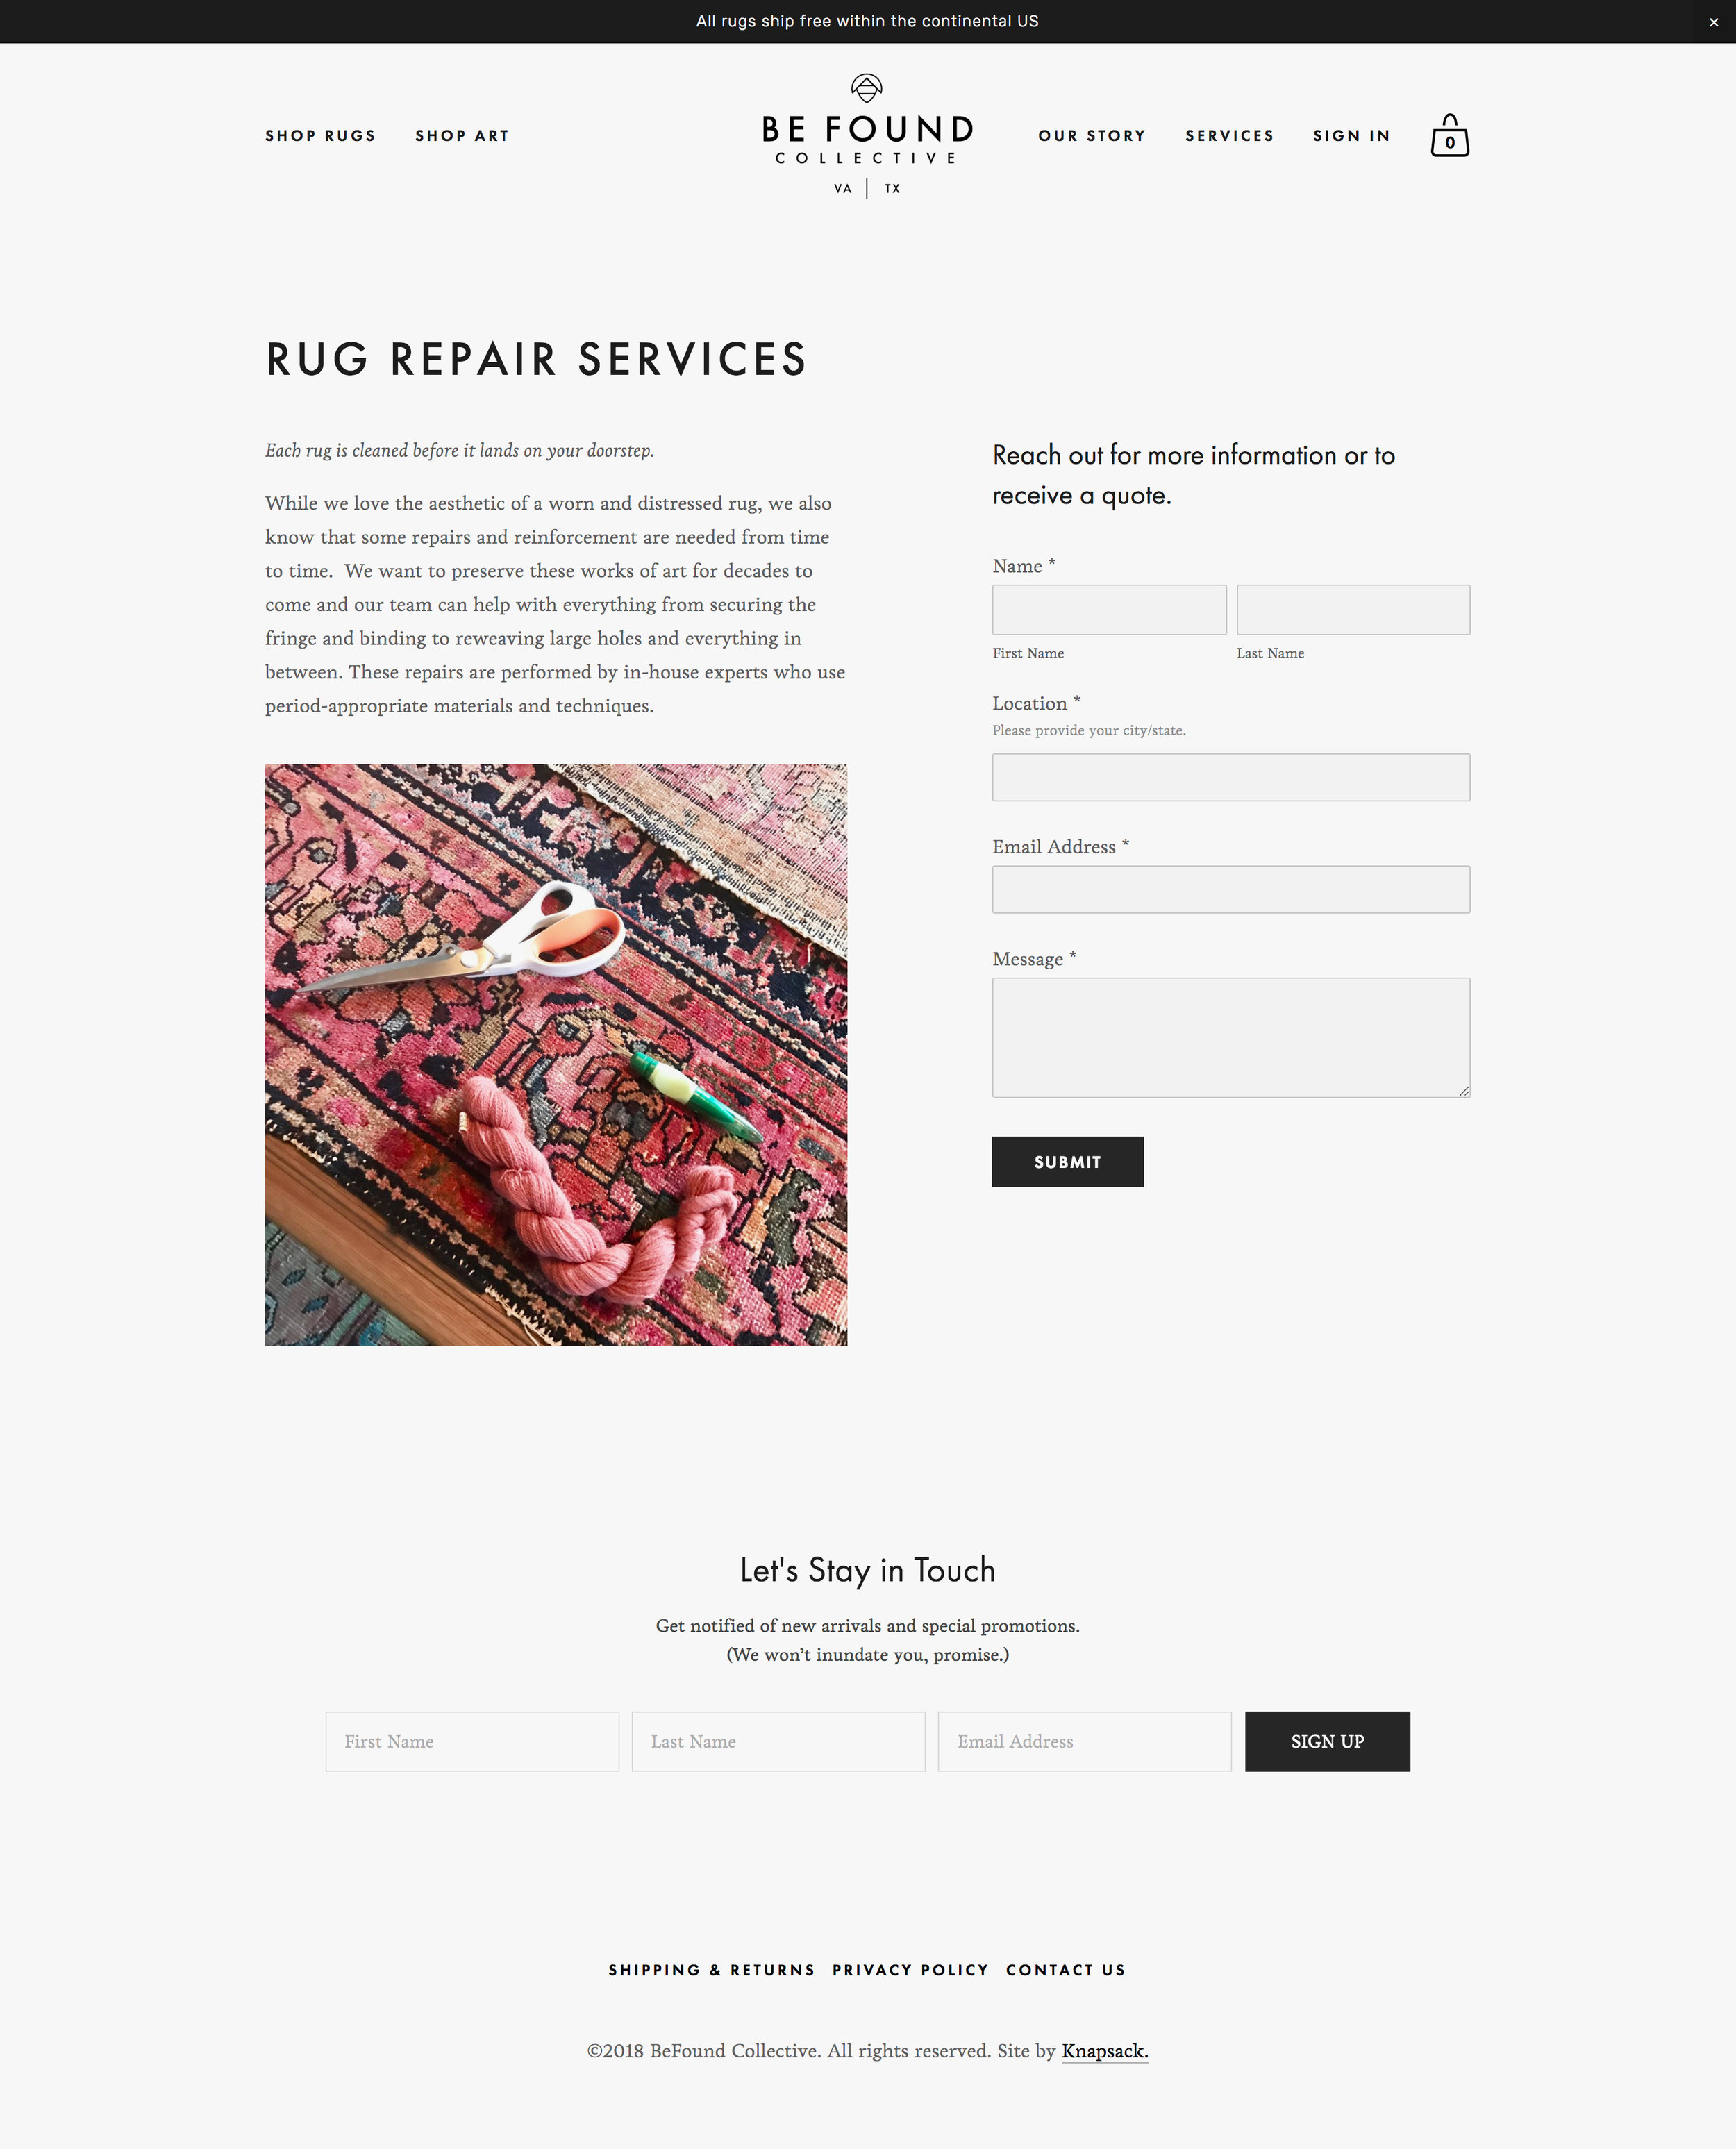 BeFound-Collective-Services-Macbook-Overlay.jpg